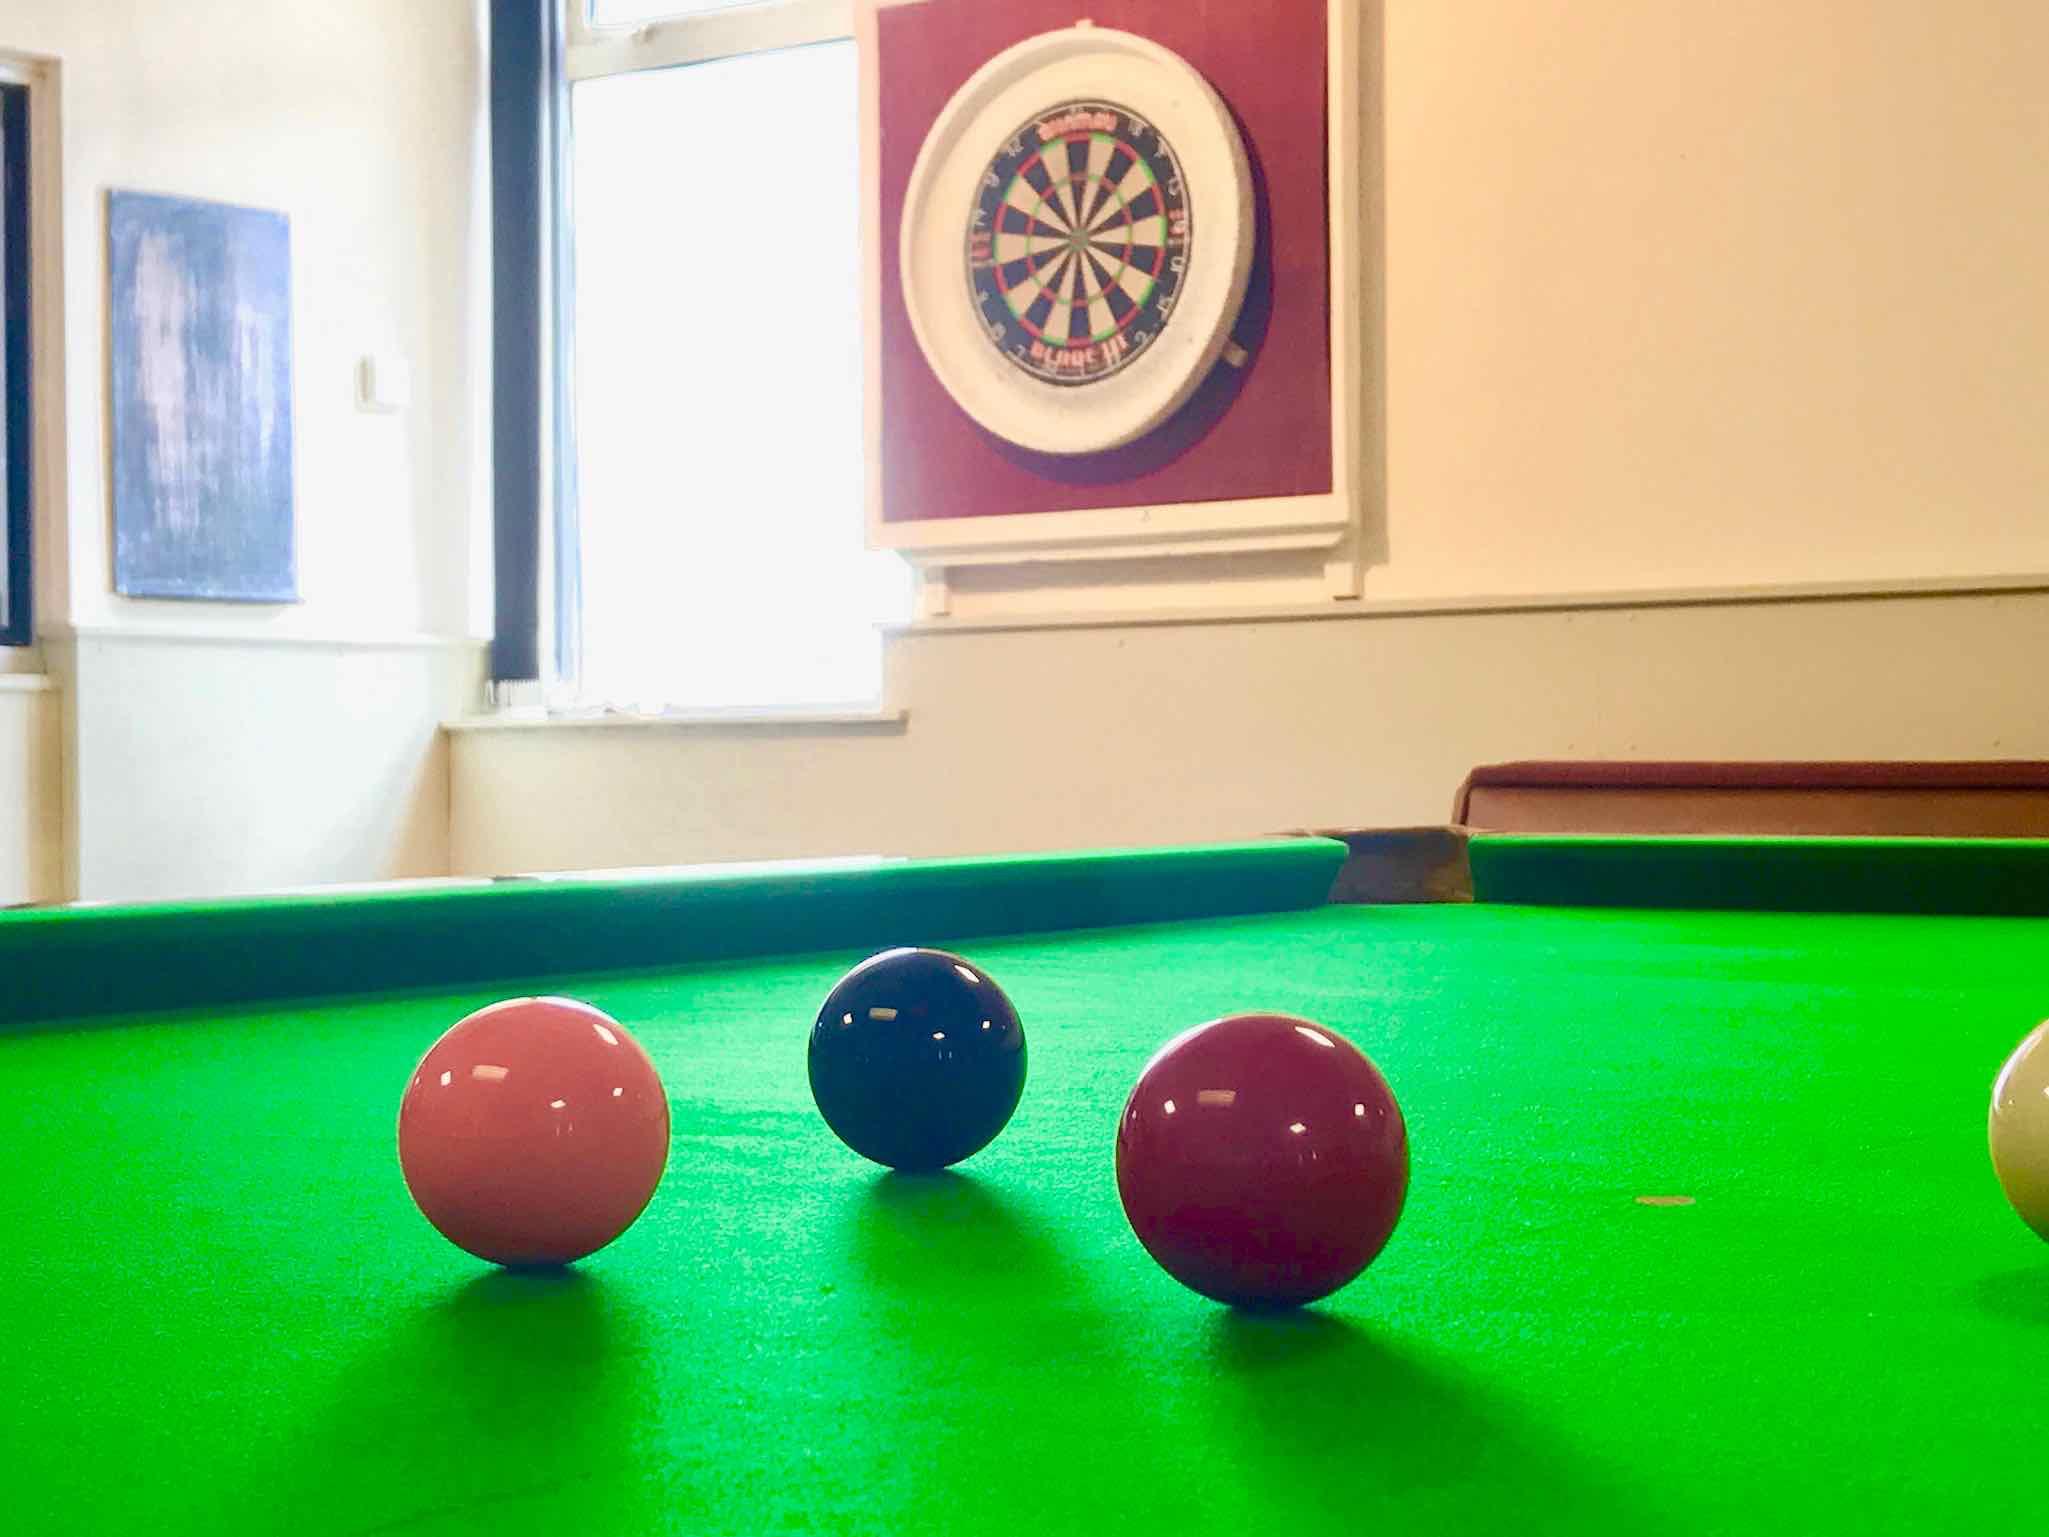 Gwersyllt Sports & Social Club Snooker Table and Darts Board